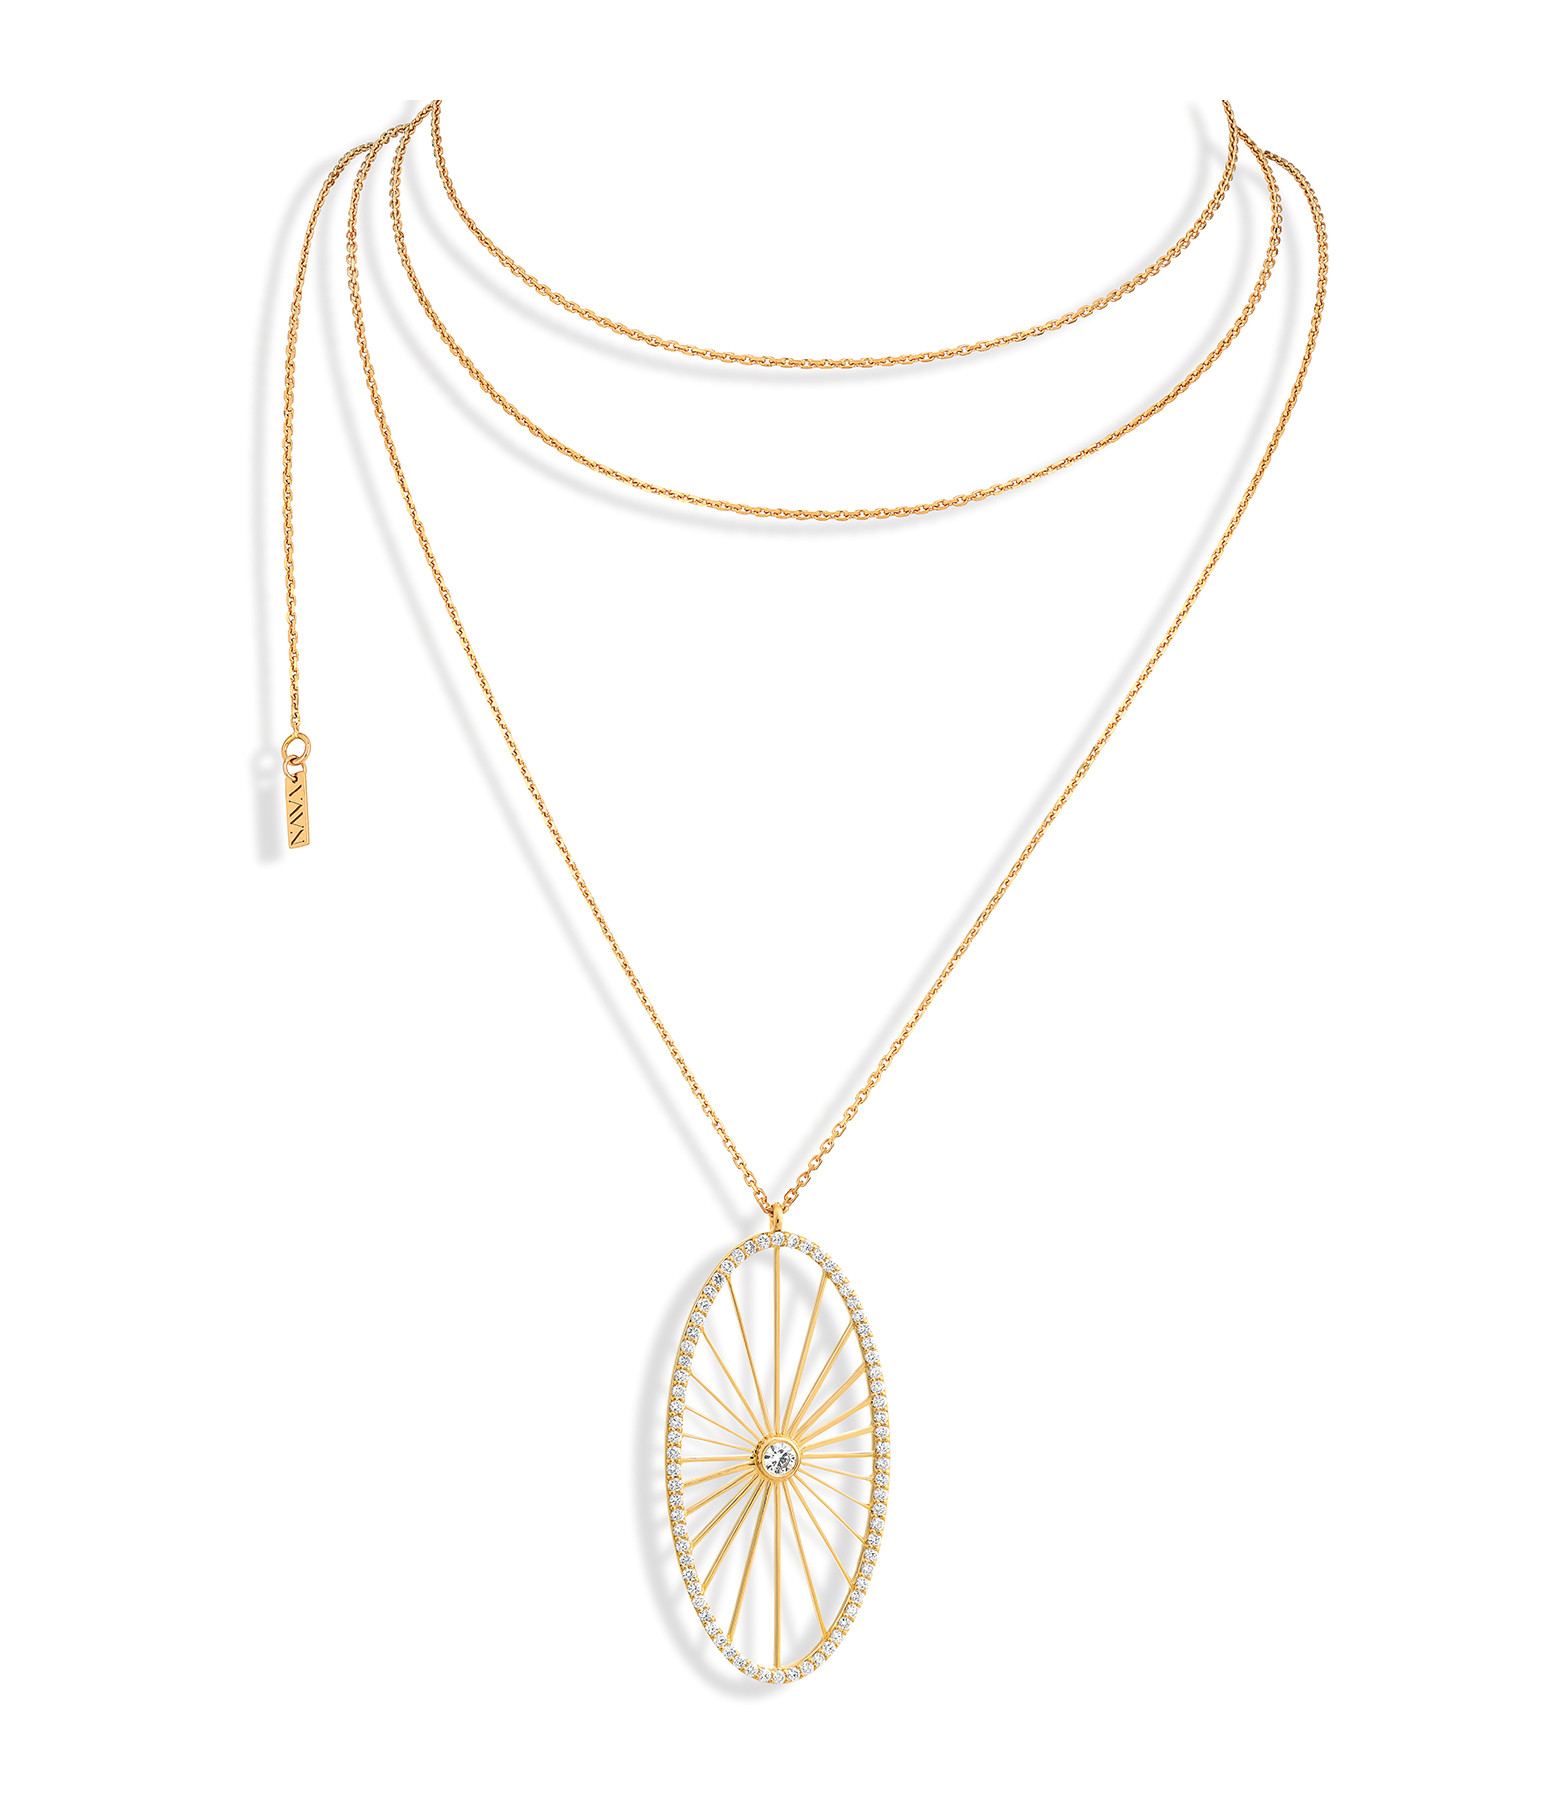 NAVA JOAILLERIE - Sautoir Cheyenne Ovale Diamants Or Jaune